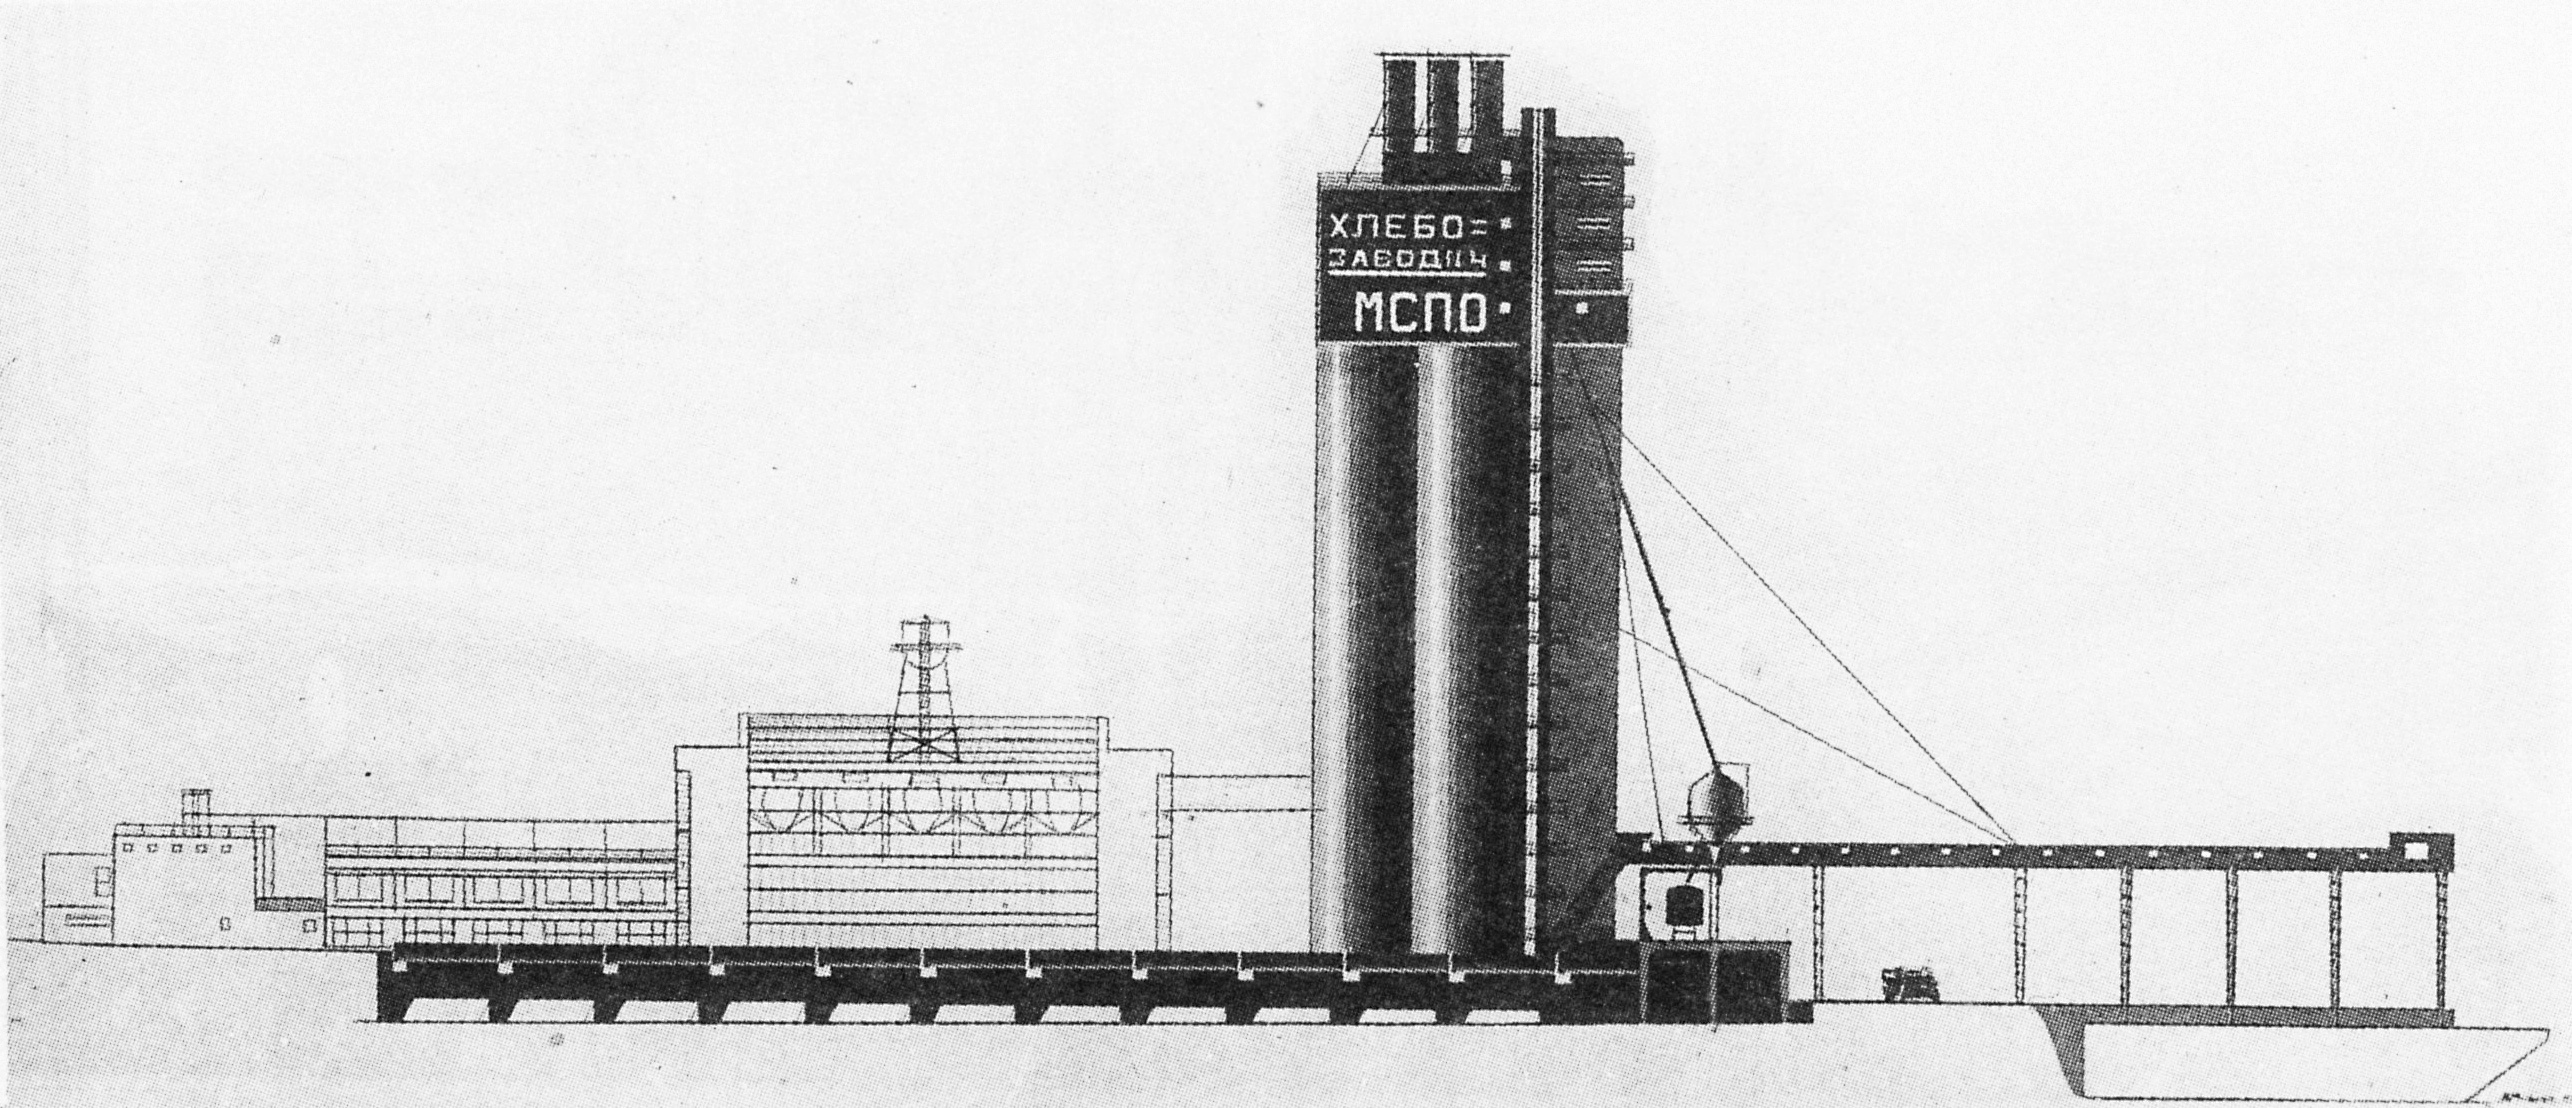 A. Mostakov, Facade view of a bread factory (bread combine), 1925